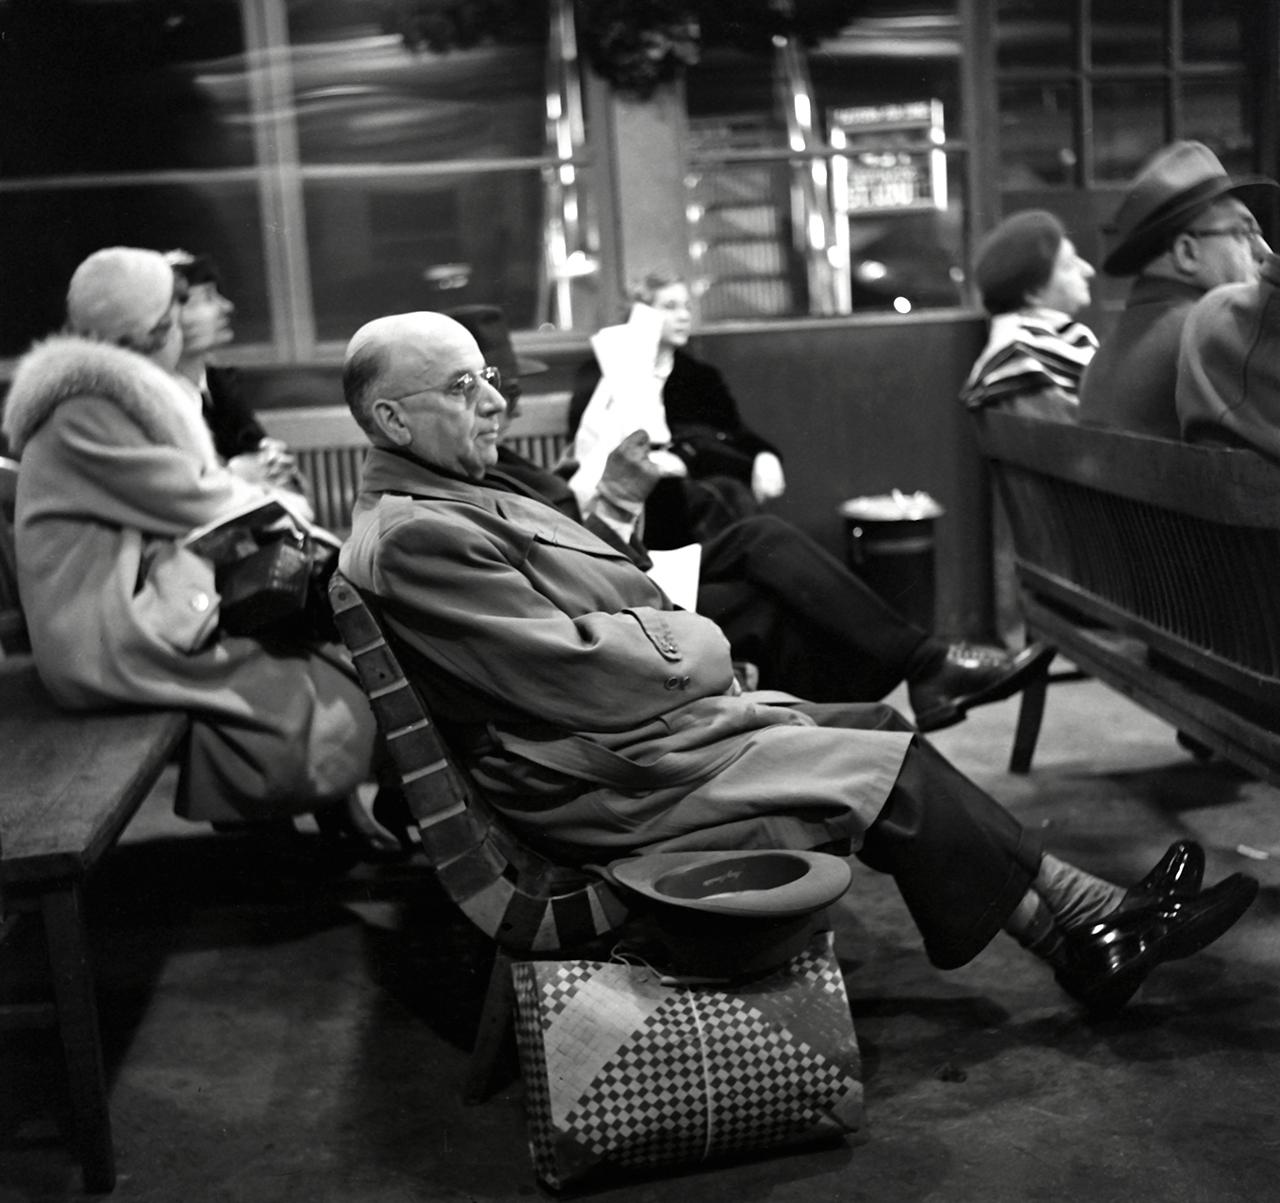 Waiting © Martin Elkort